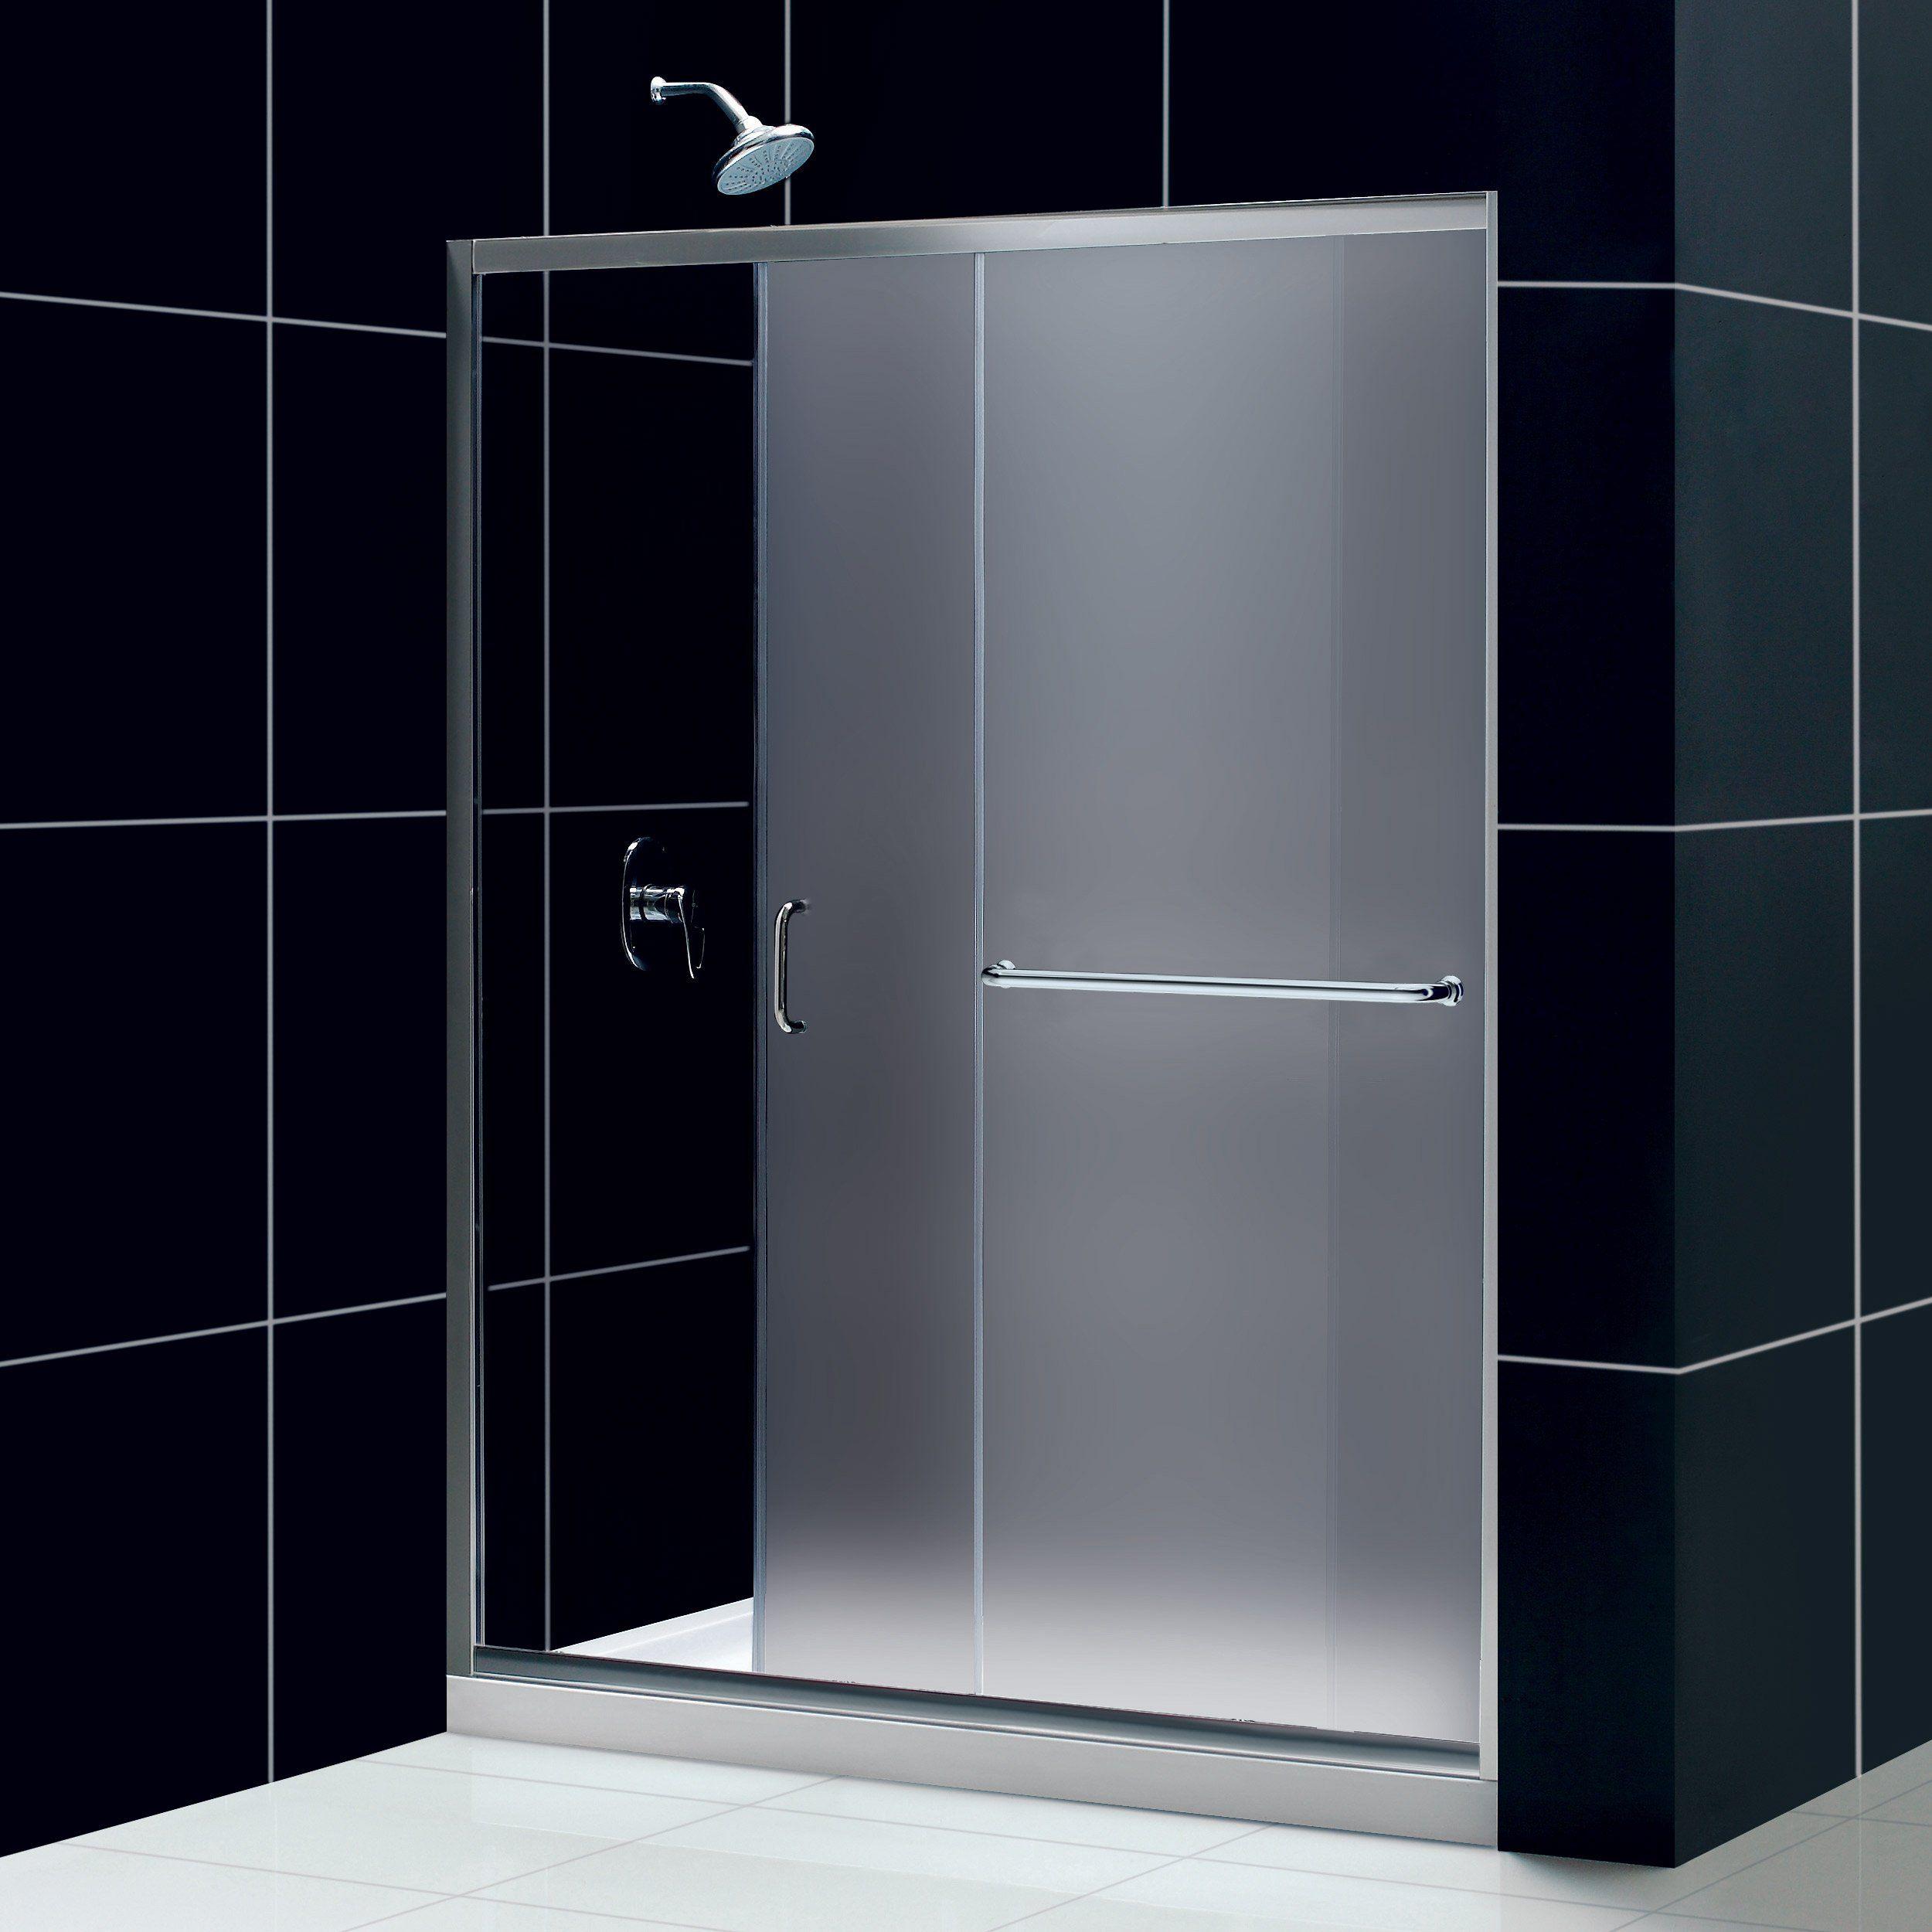 DreamLine Infinity-Z 56 to Sliding Shower Door, Frosted Glass, Chrome  Finish - Mega Supply Store